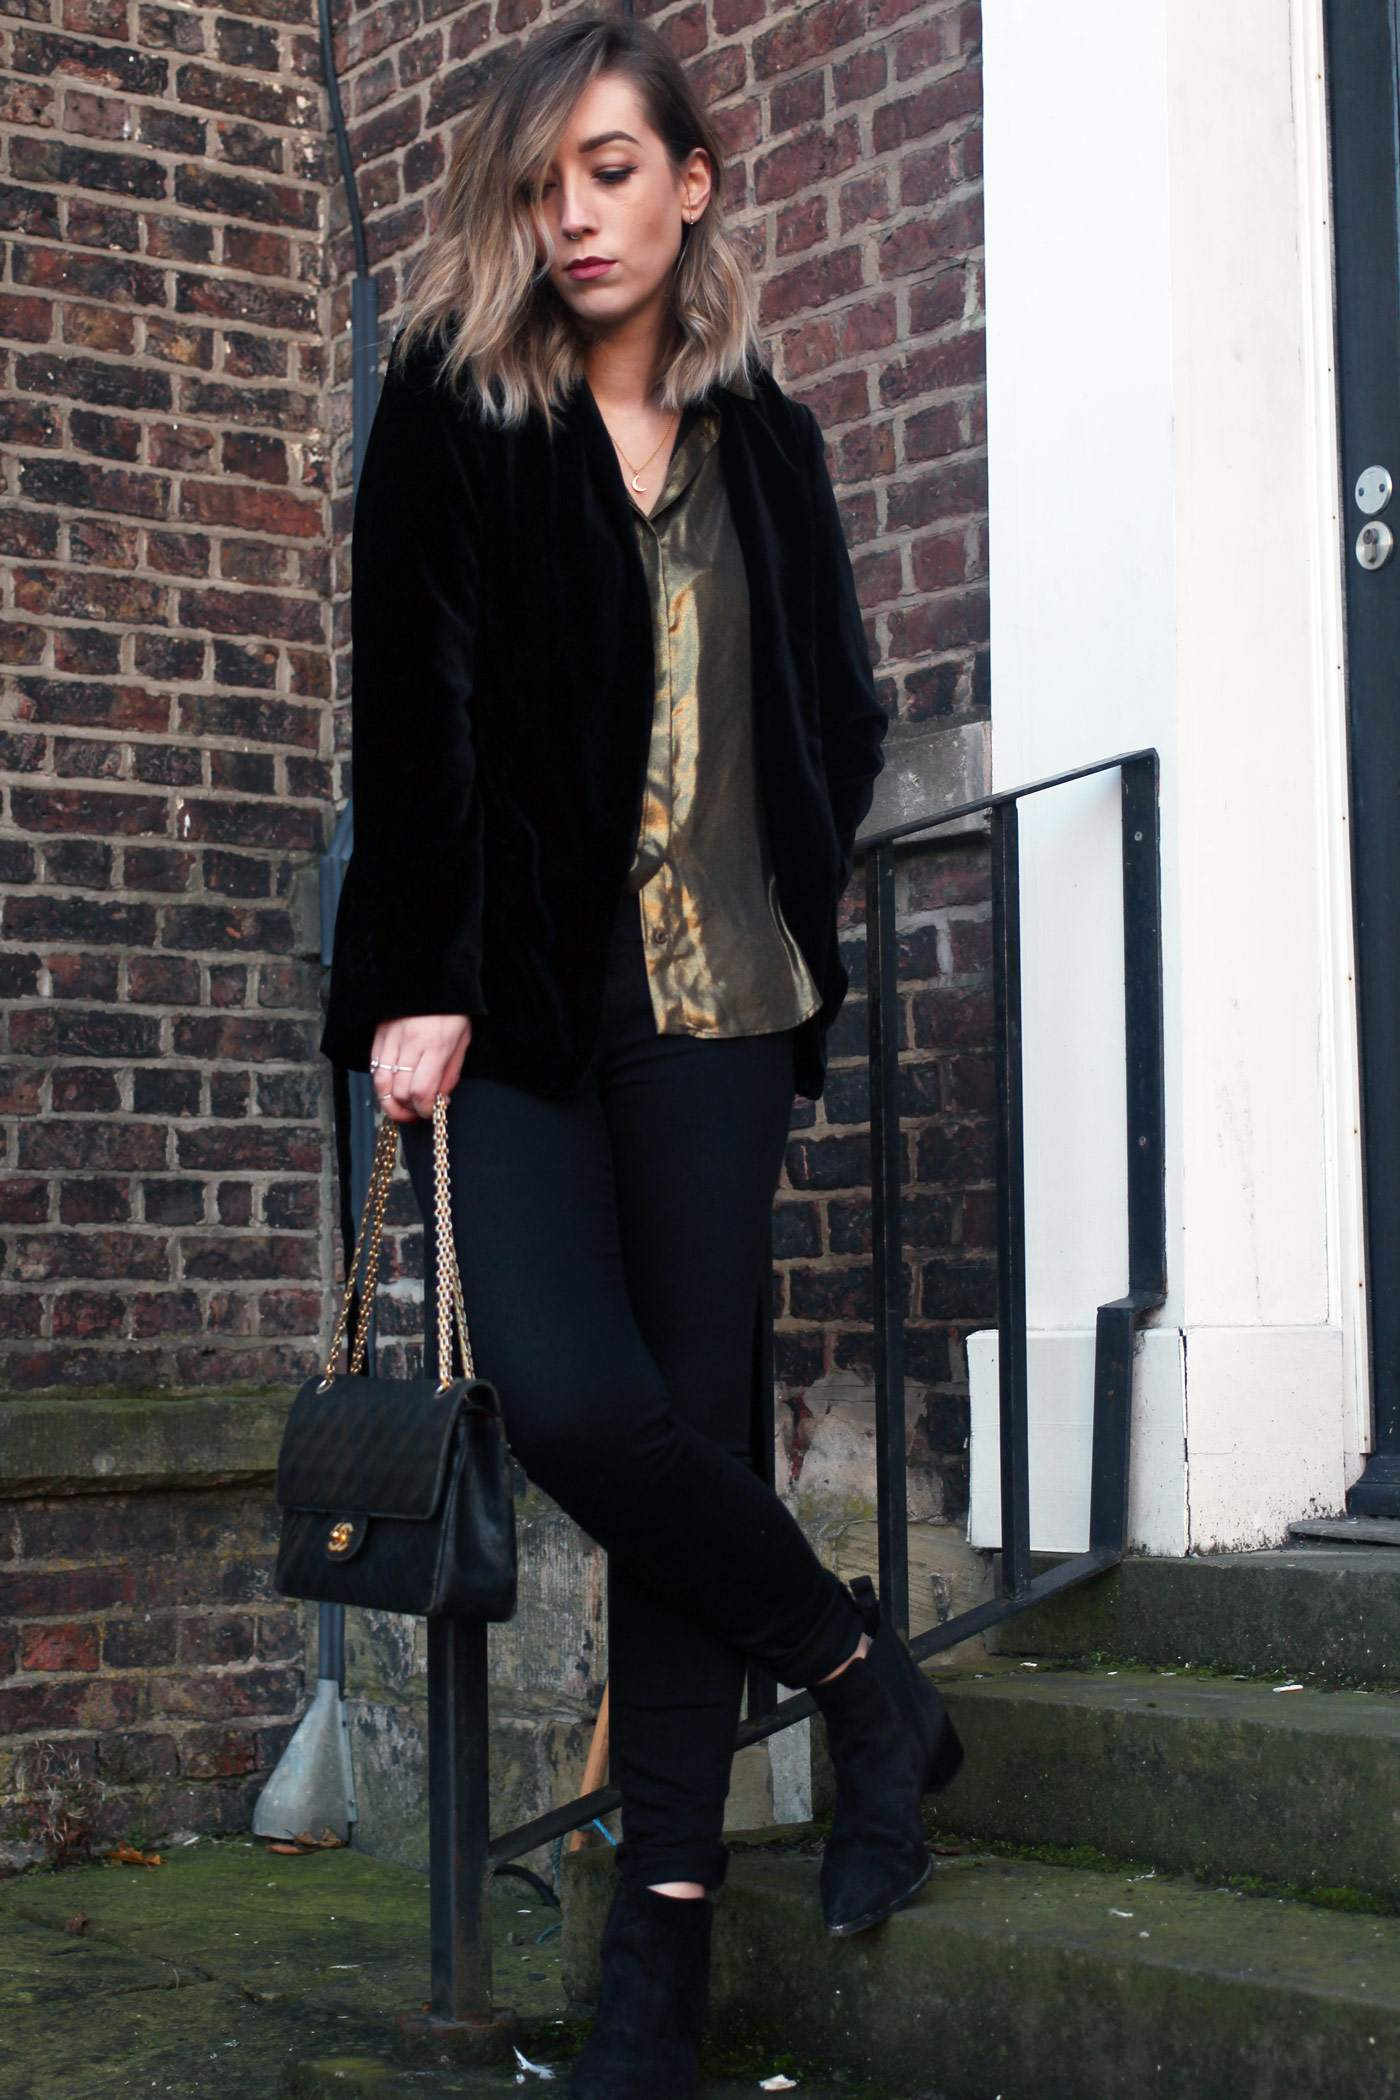 zara-velvet-belted-blazer-gold-shirt-vintage-chanel-acne-jensen-1